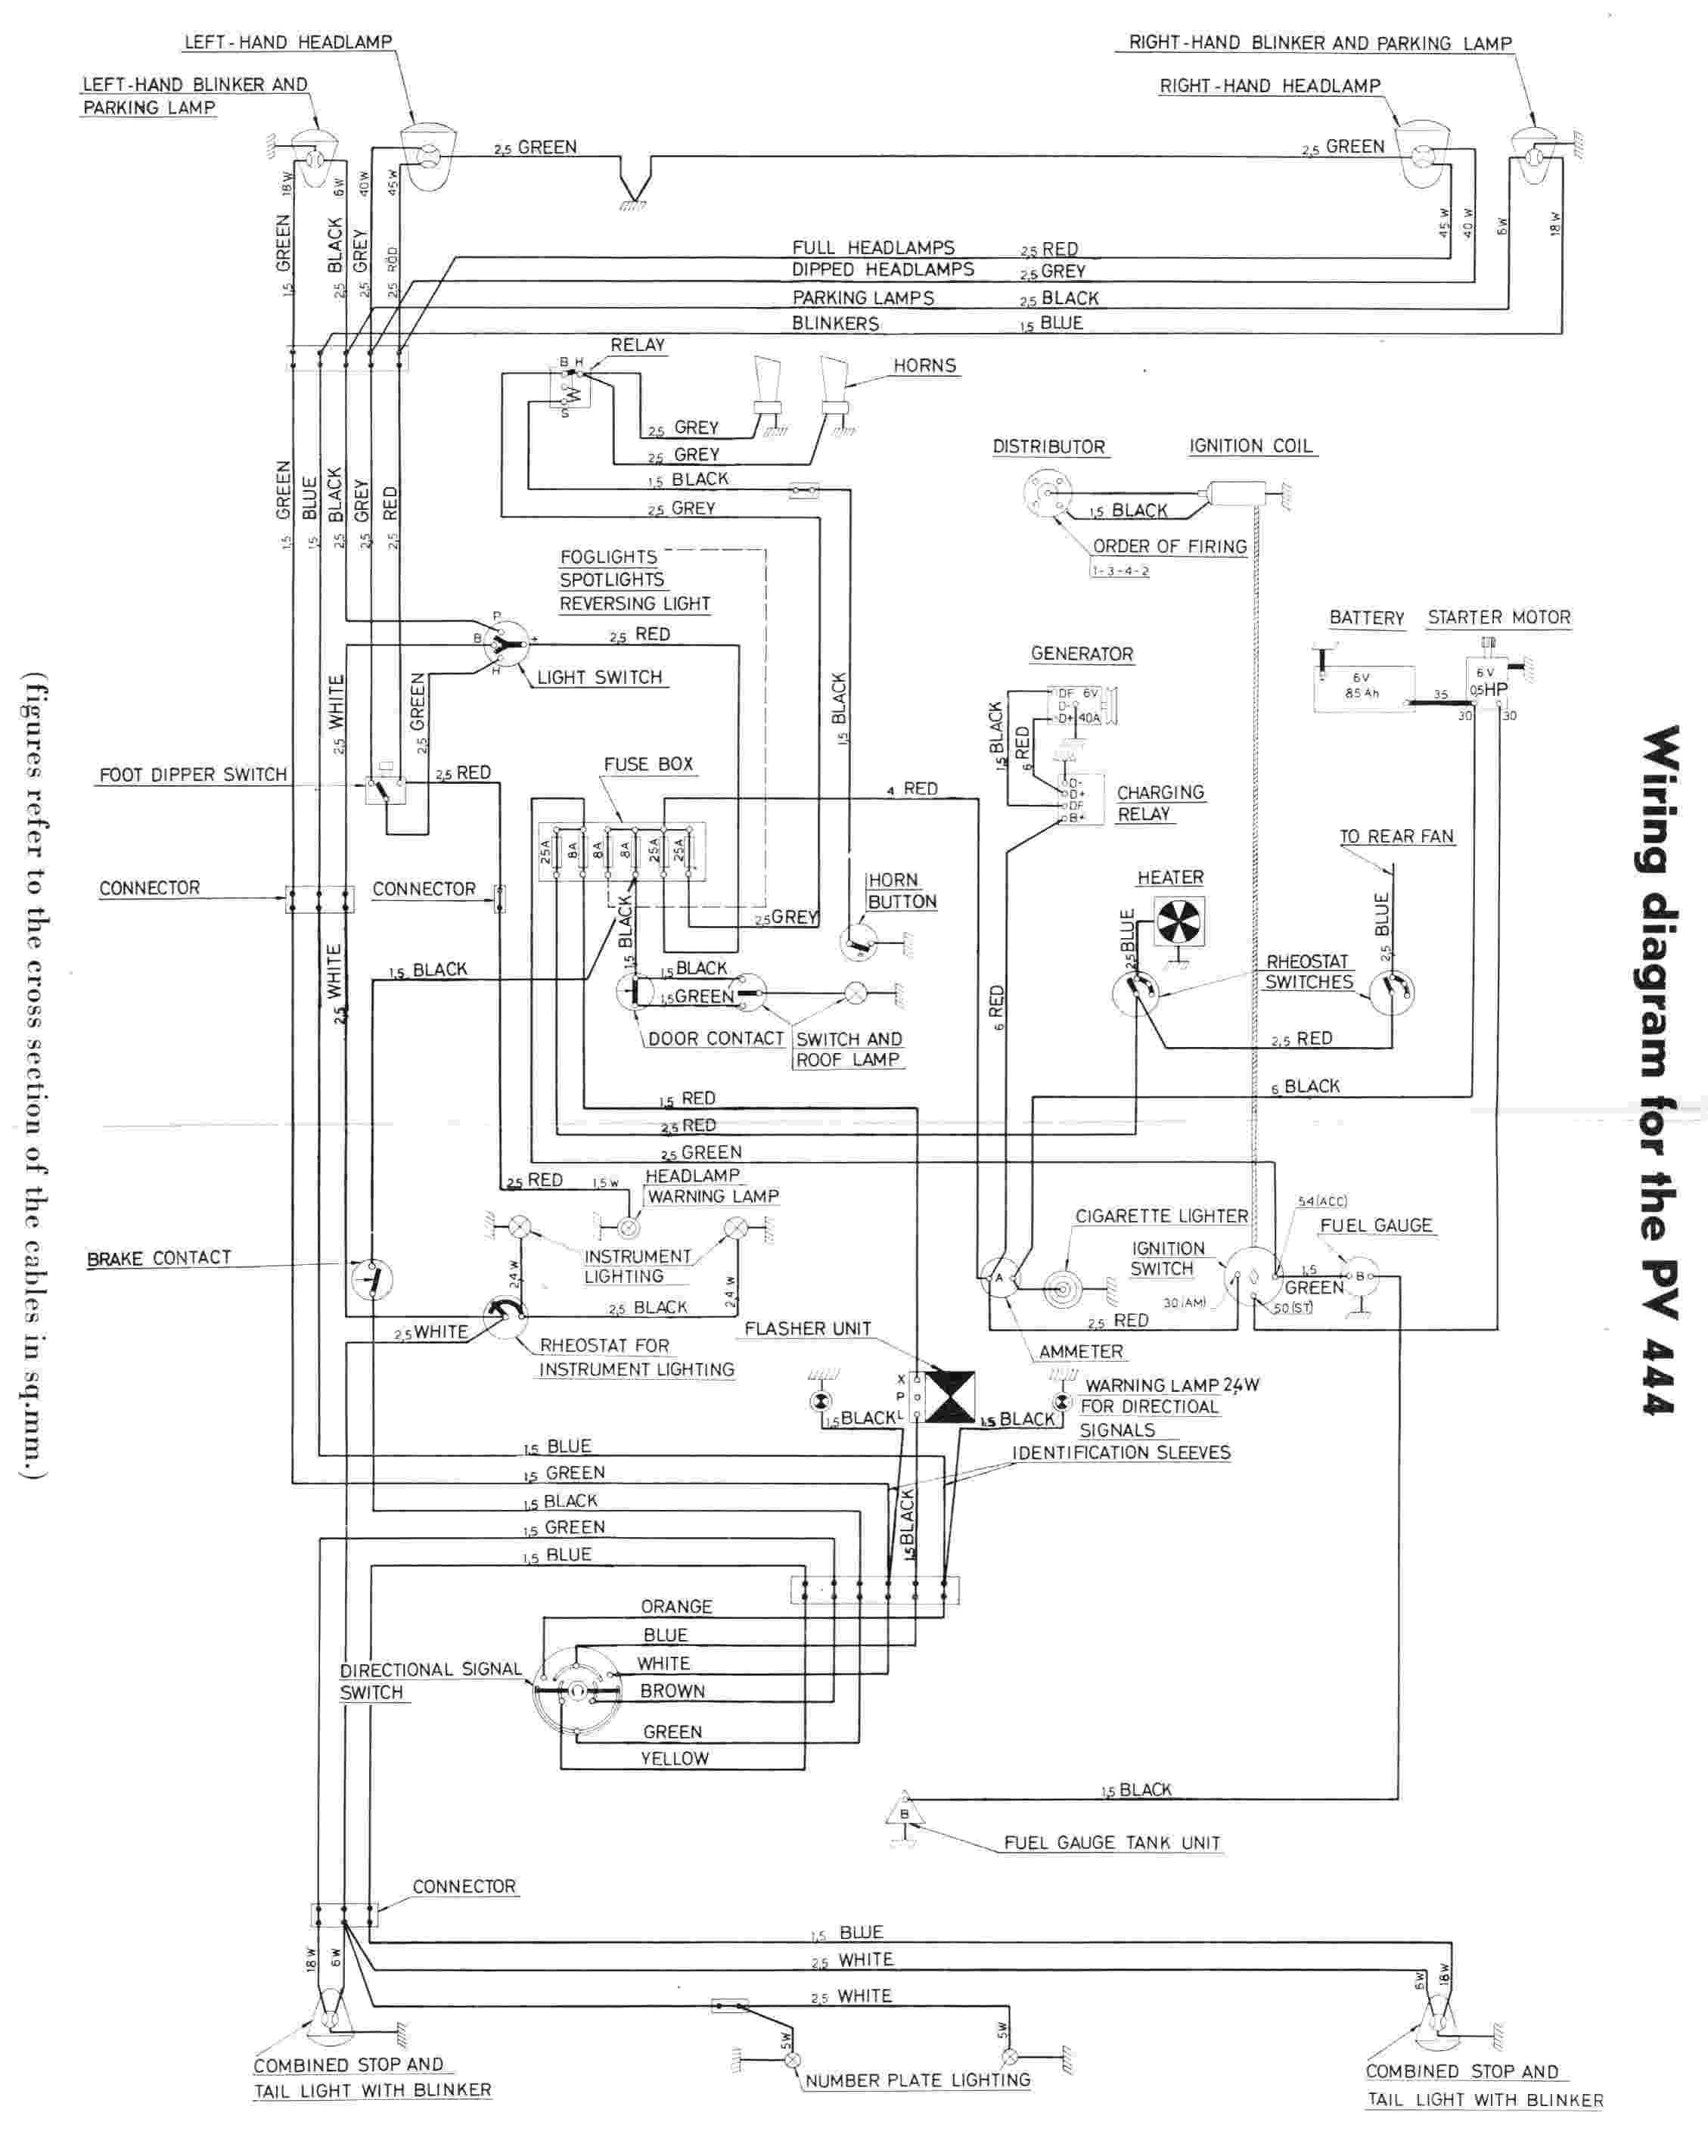 volvo 360 wiring diagram online wiring diagramvn alternator wiring diagram wiring diagrams volvo 360 wiring diagram [ 2258 x 2850 Pixel ]